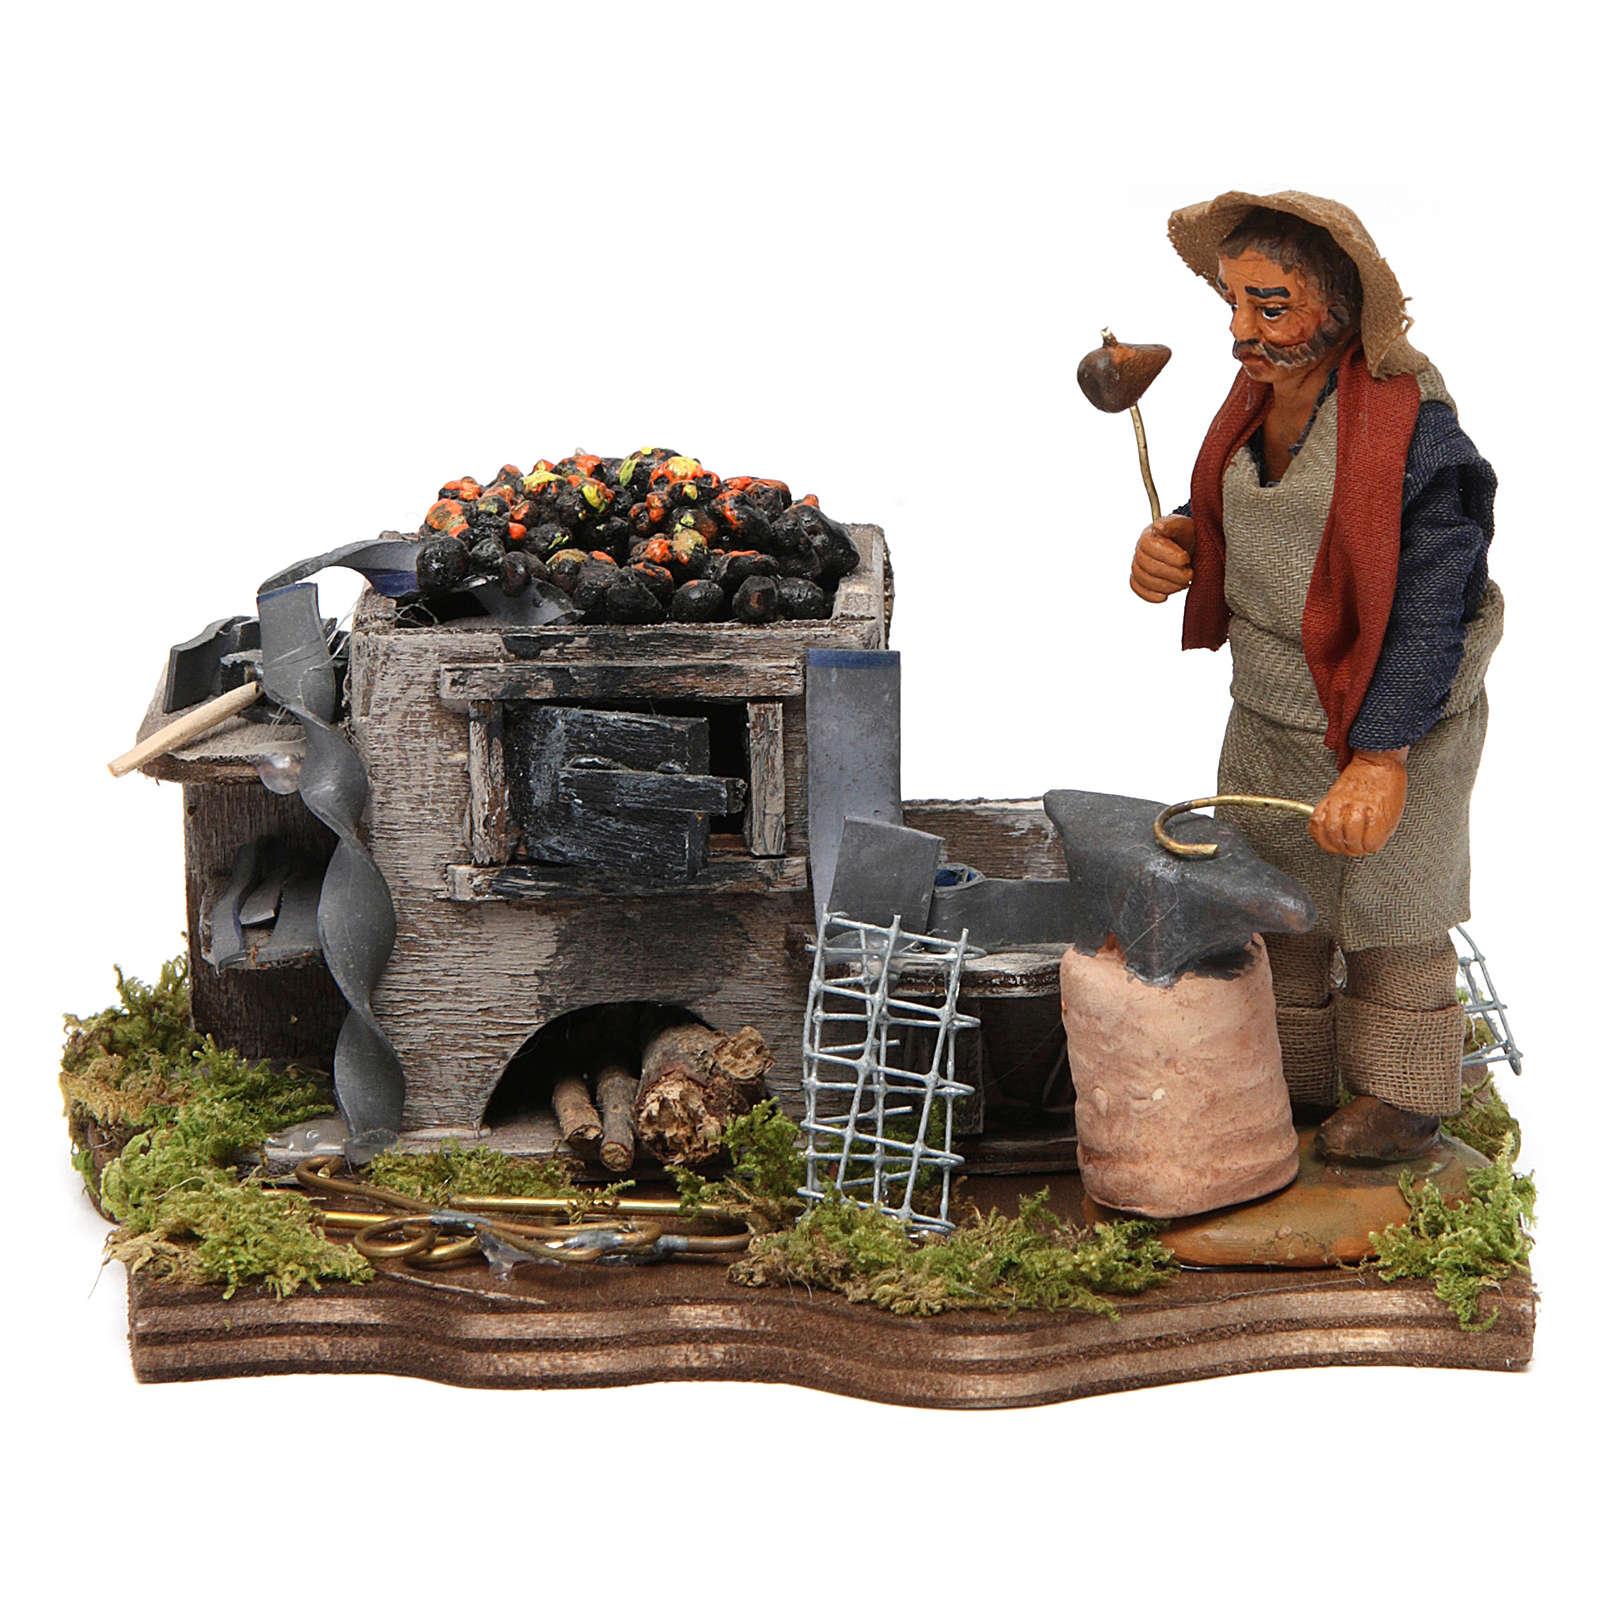 Blacksmith with forge, Neapolitan nativity figurine, 10cm 4